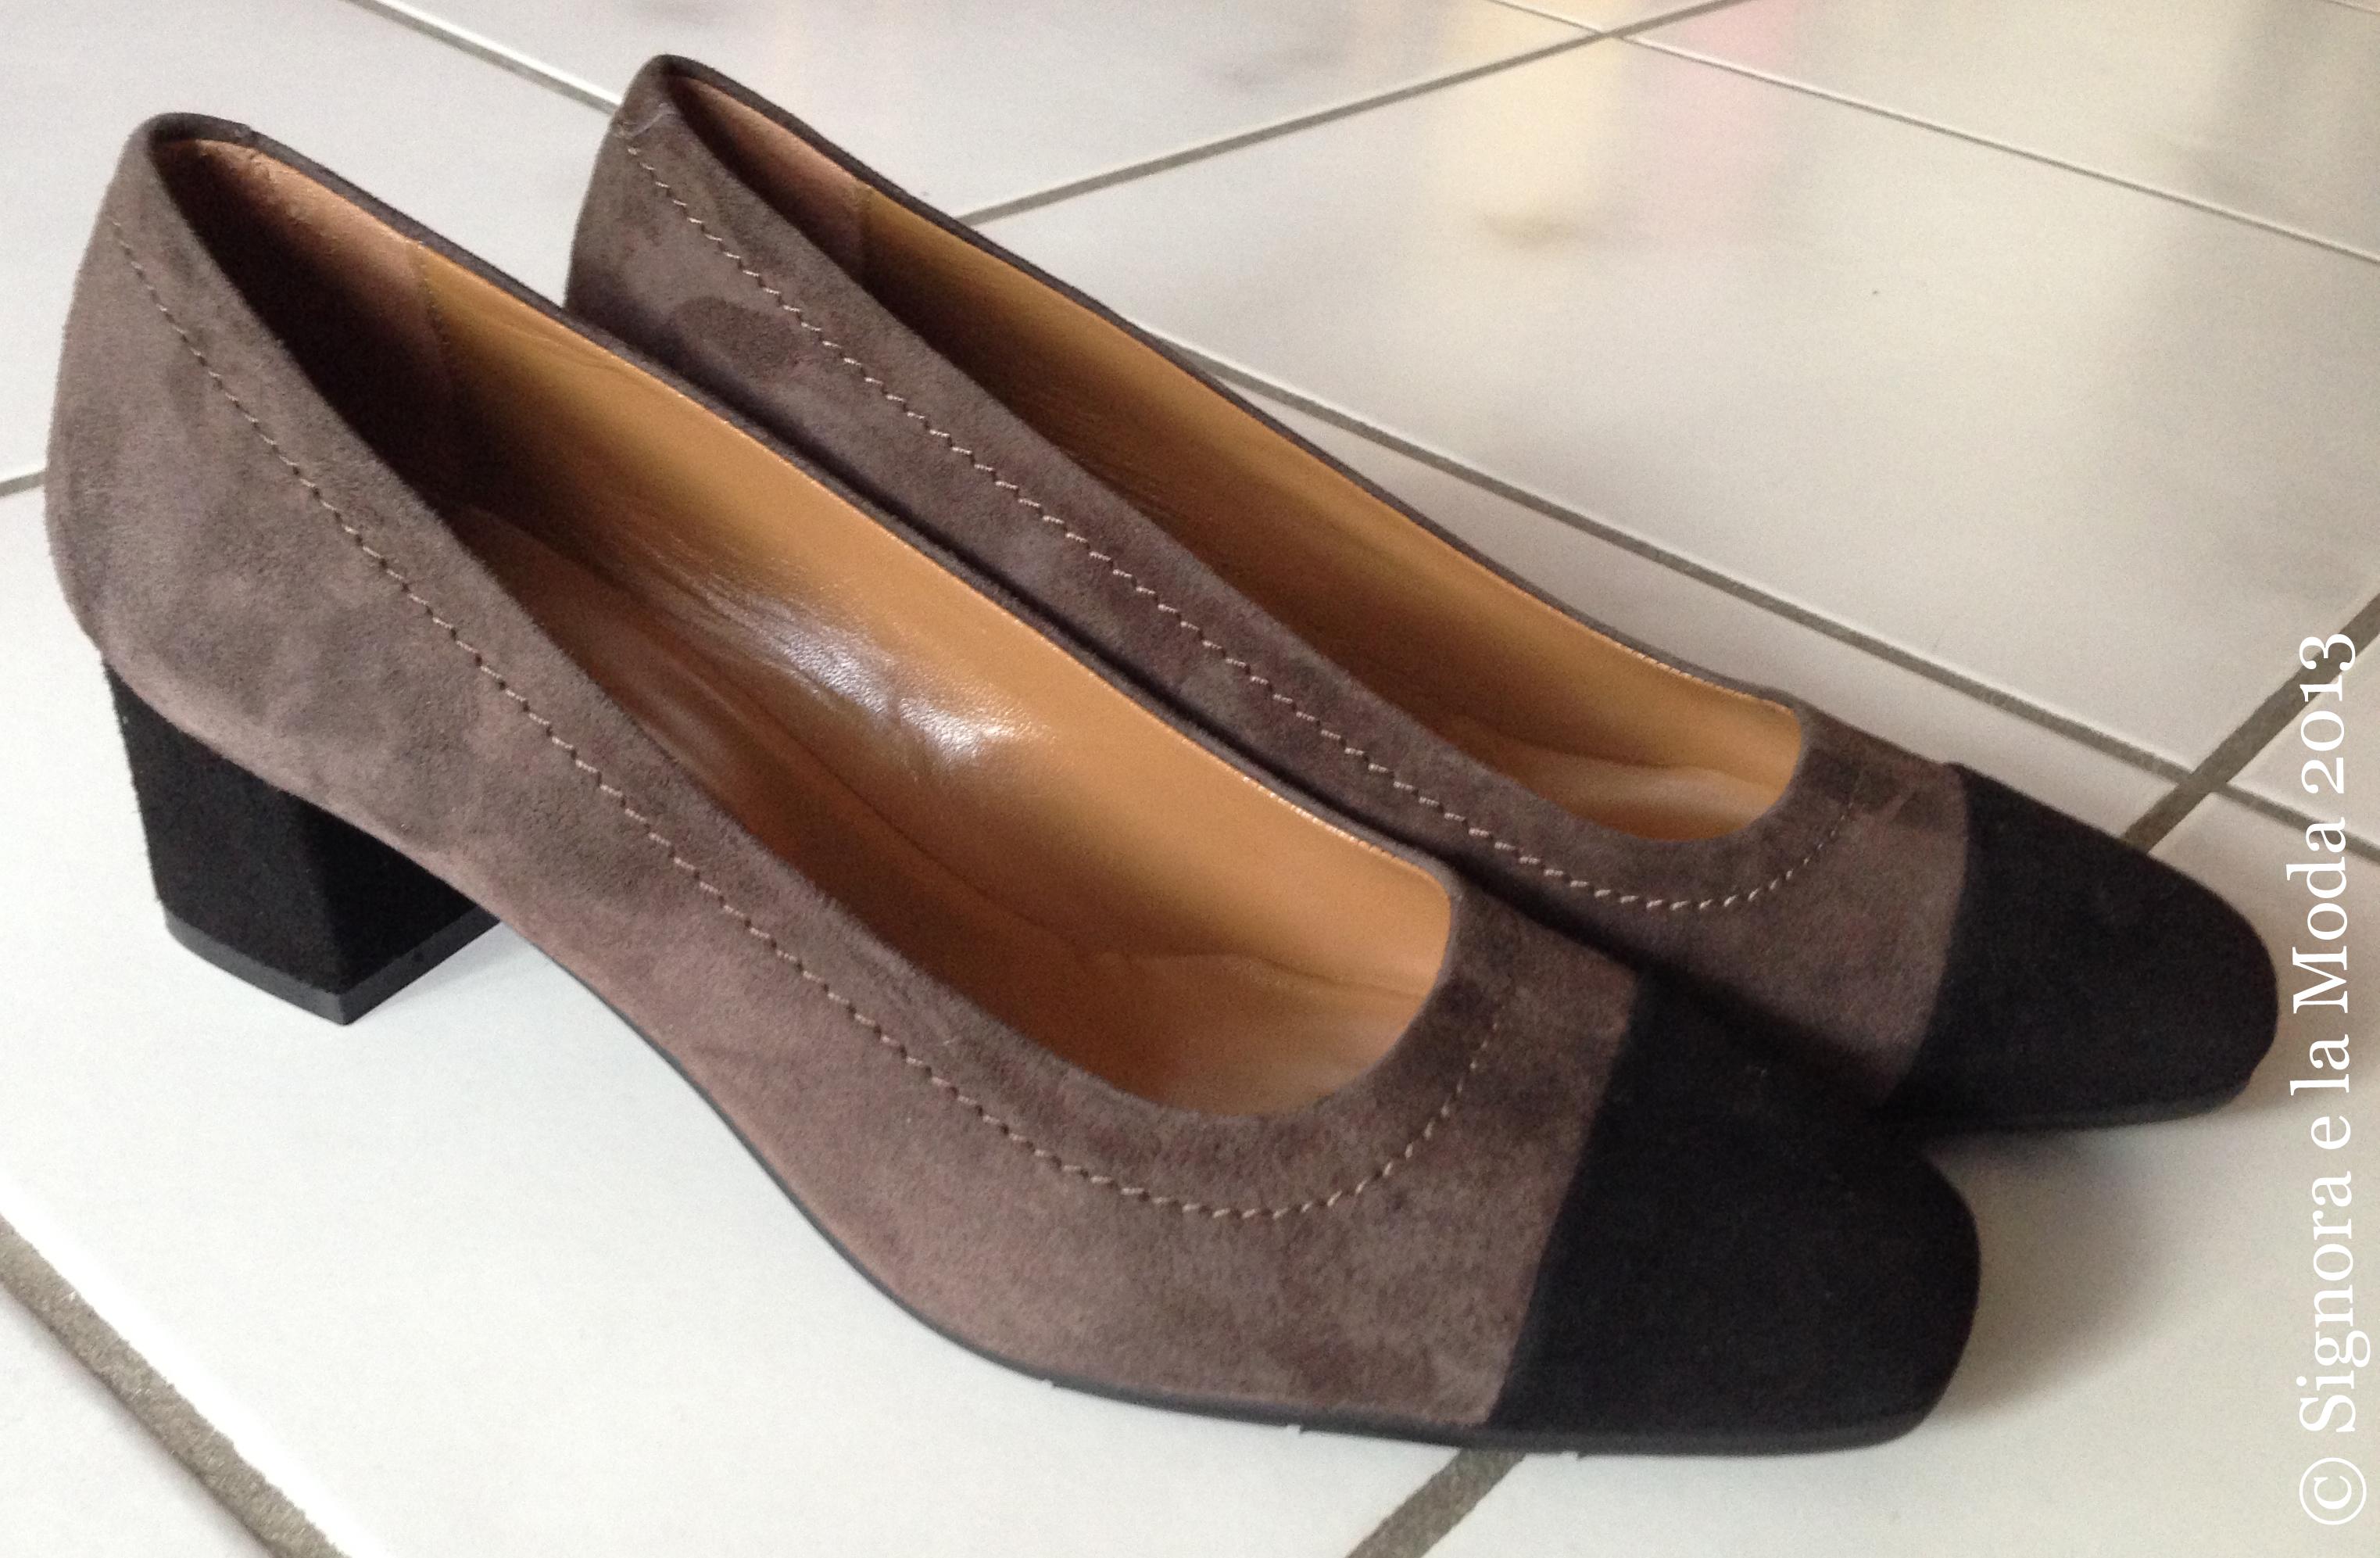 Pollini Studio zweifarbige Schuhe